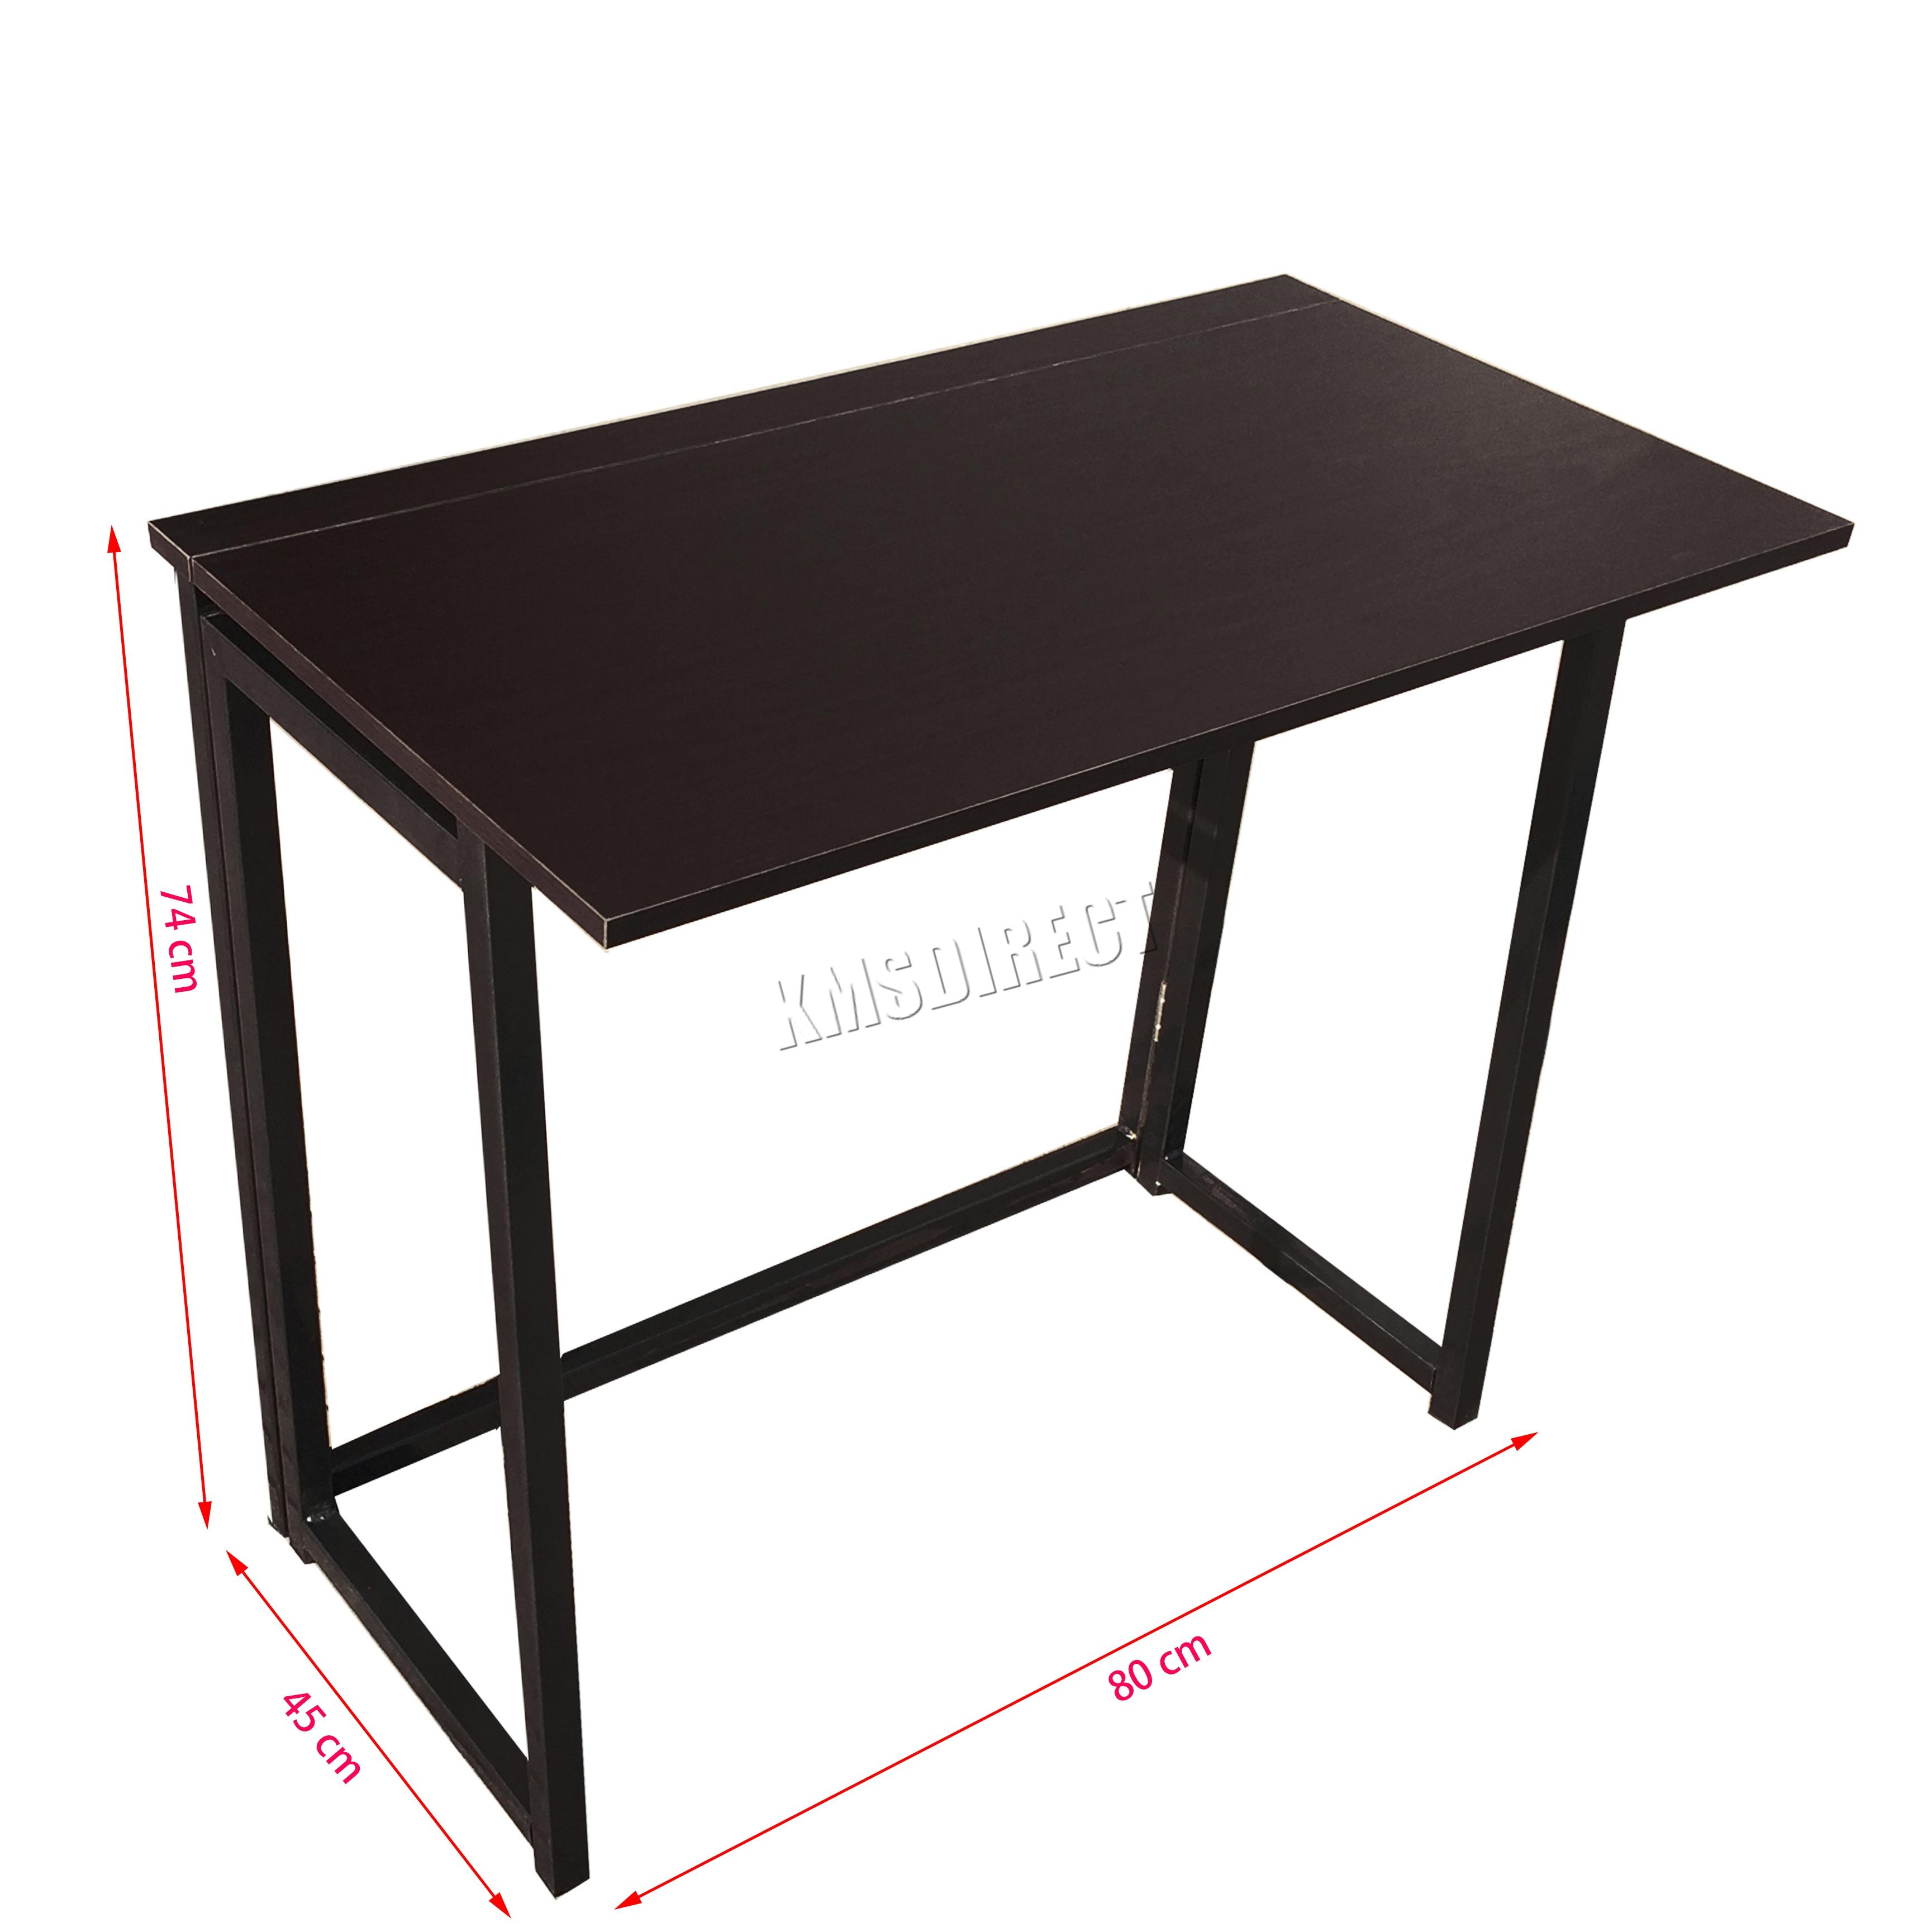 Westwood-Plegable-Computador-Escritorio-Ordenador-Portatil-Mesa-Hogar-Oficina